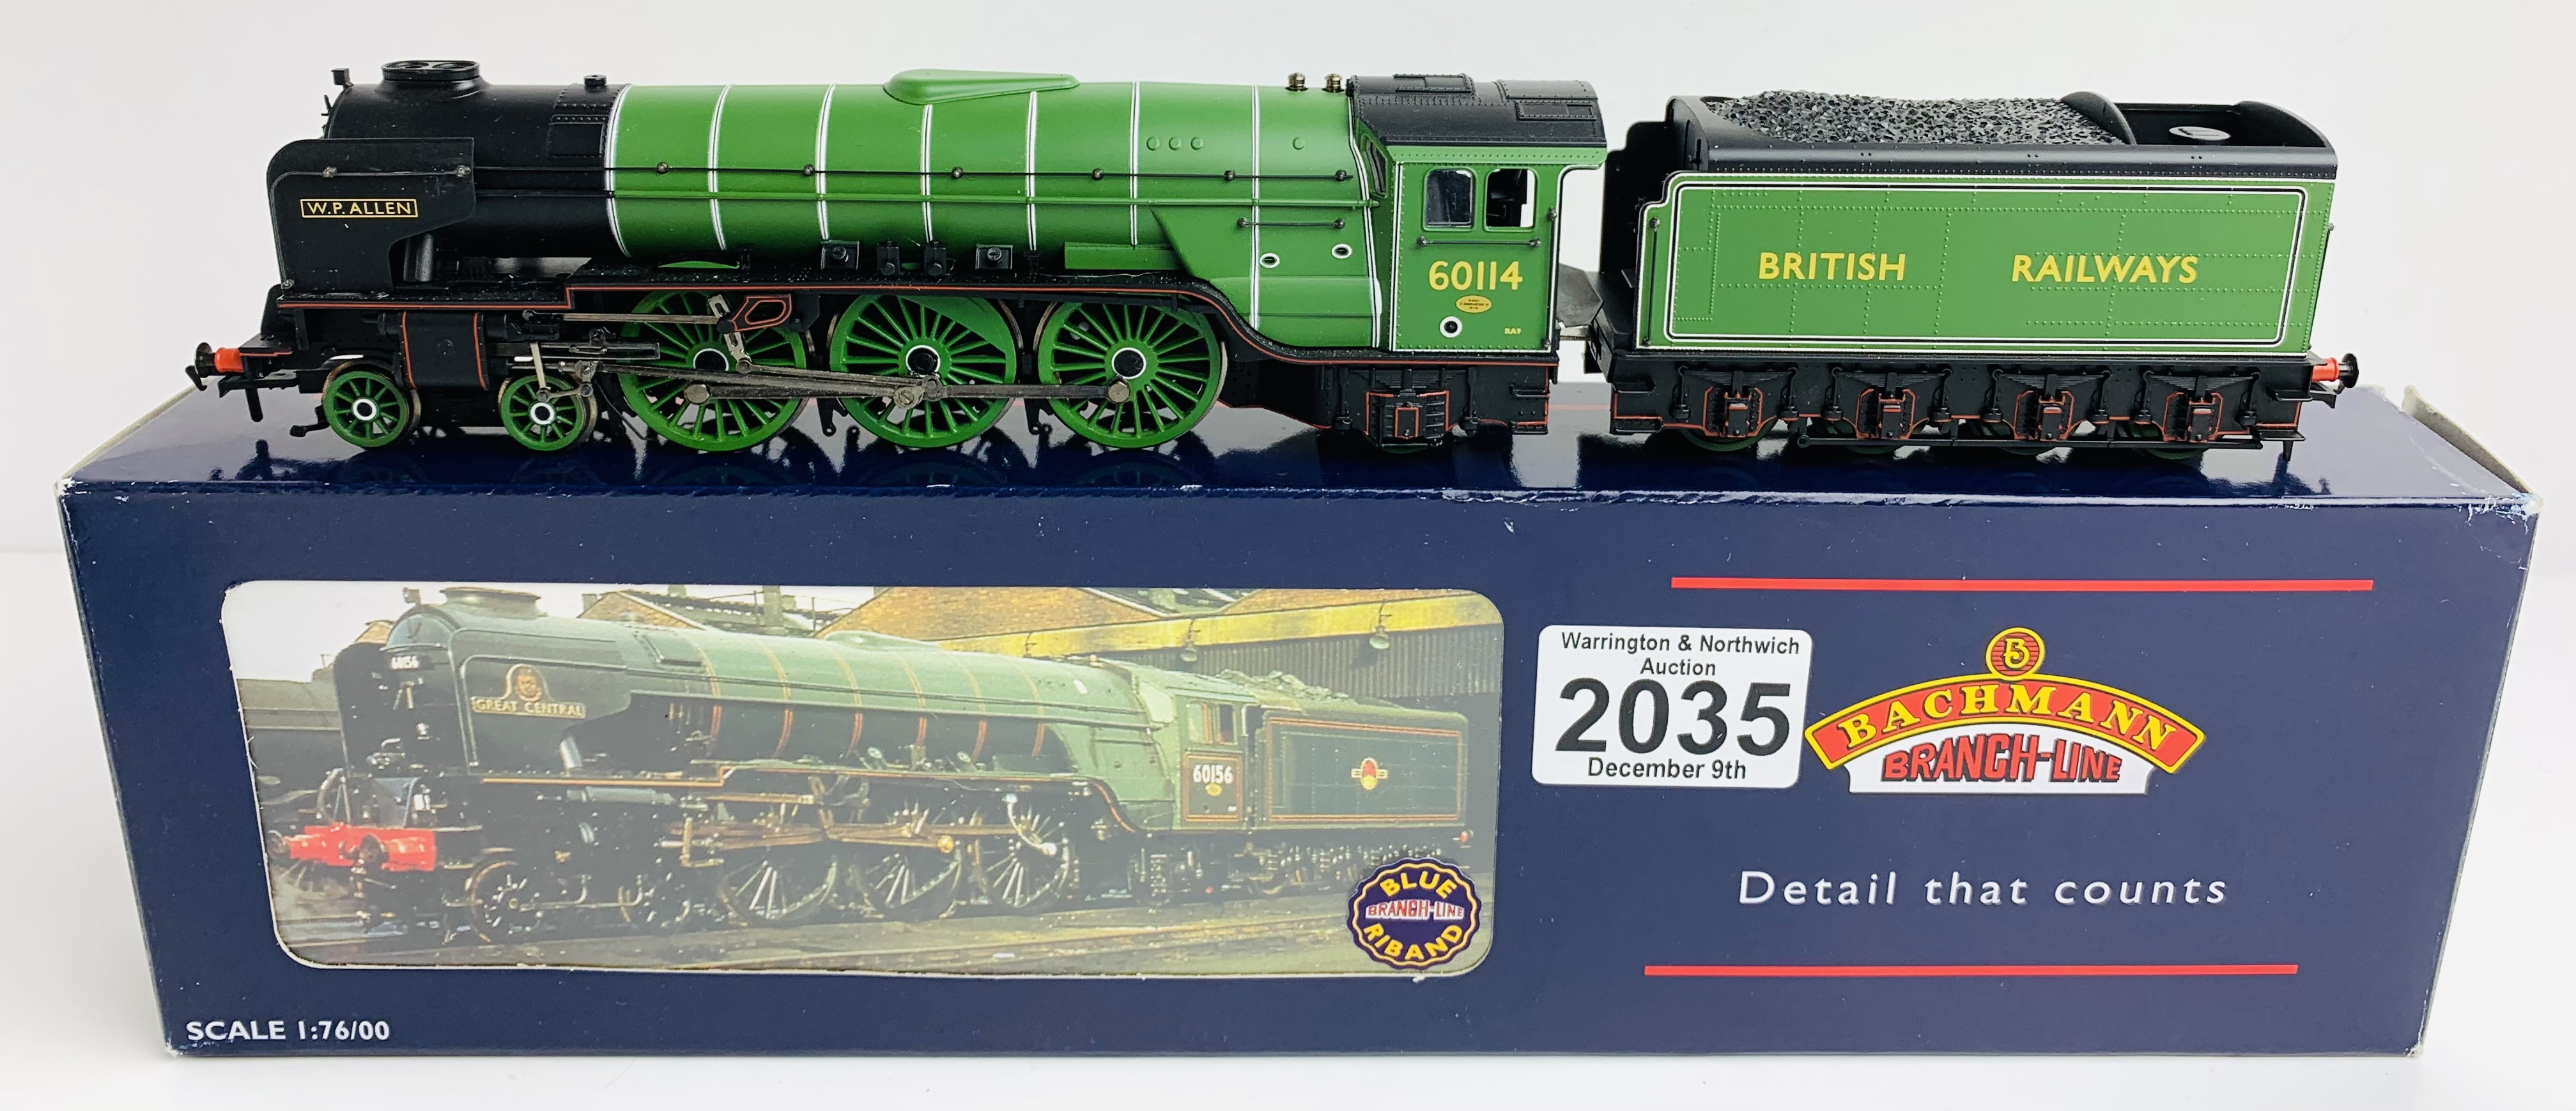 Bachmann 32-554 Class A1 60114 'W P Allen' Doncaster Green British Railways Loco - Boxed P&P Group 1